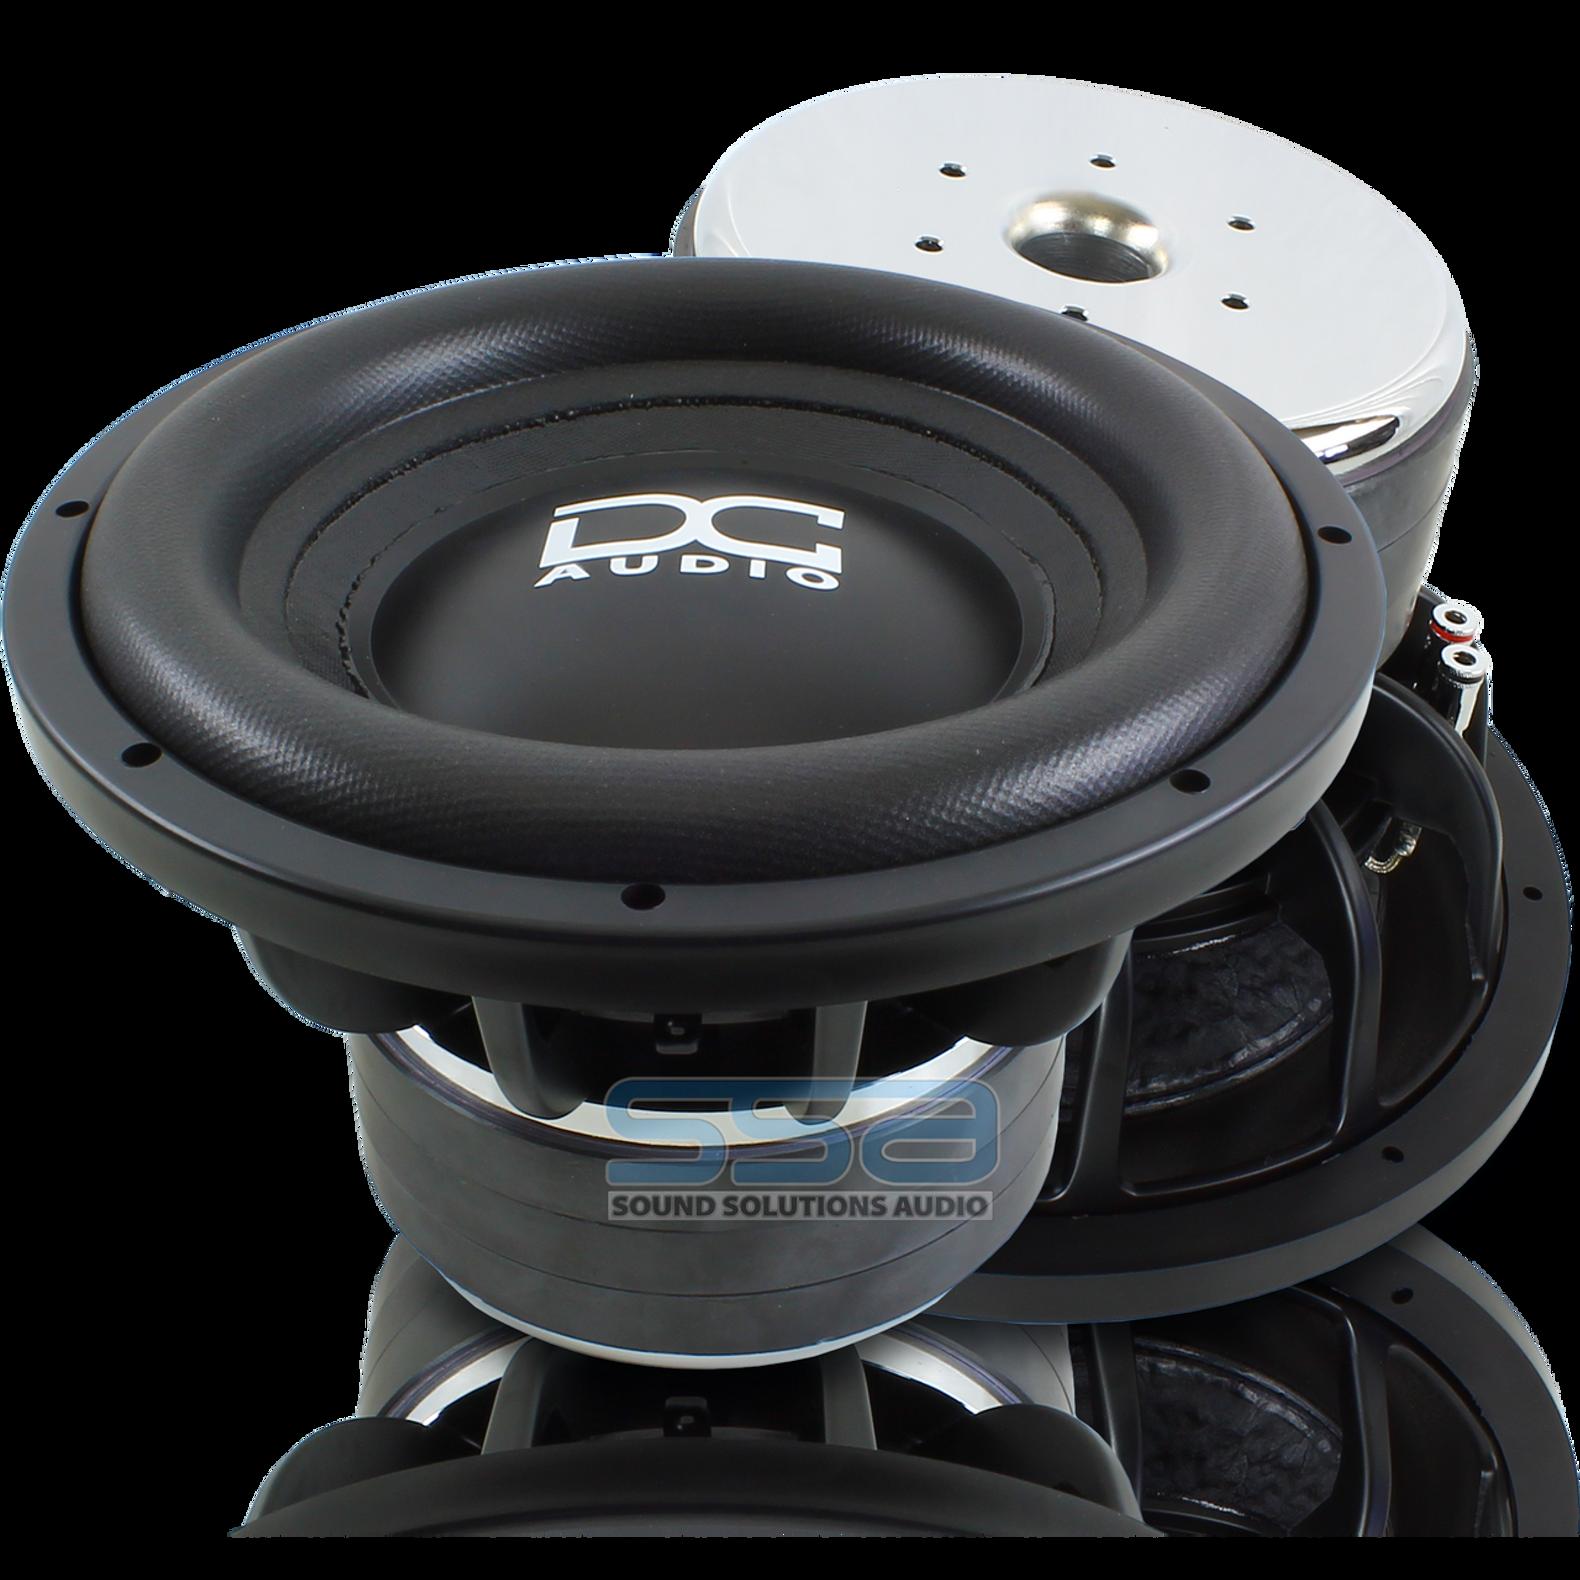 DC Audio Level 4 10 M2 1 1400w Subwoofer